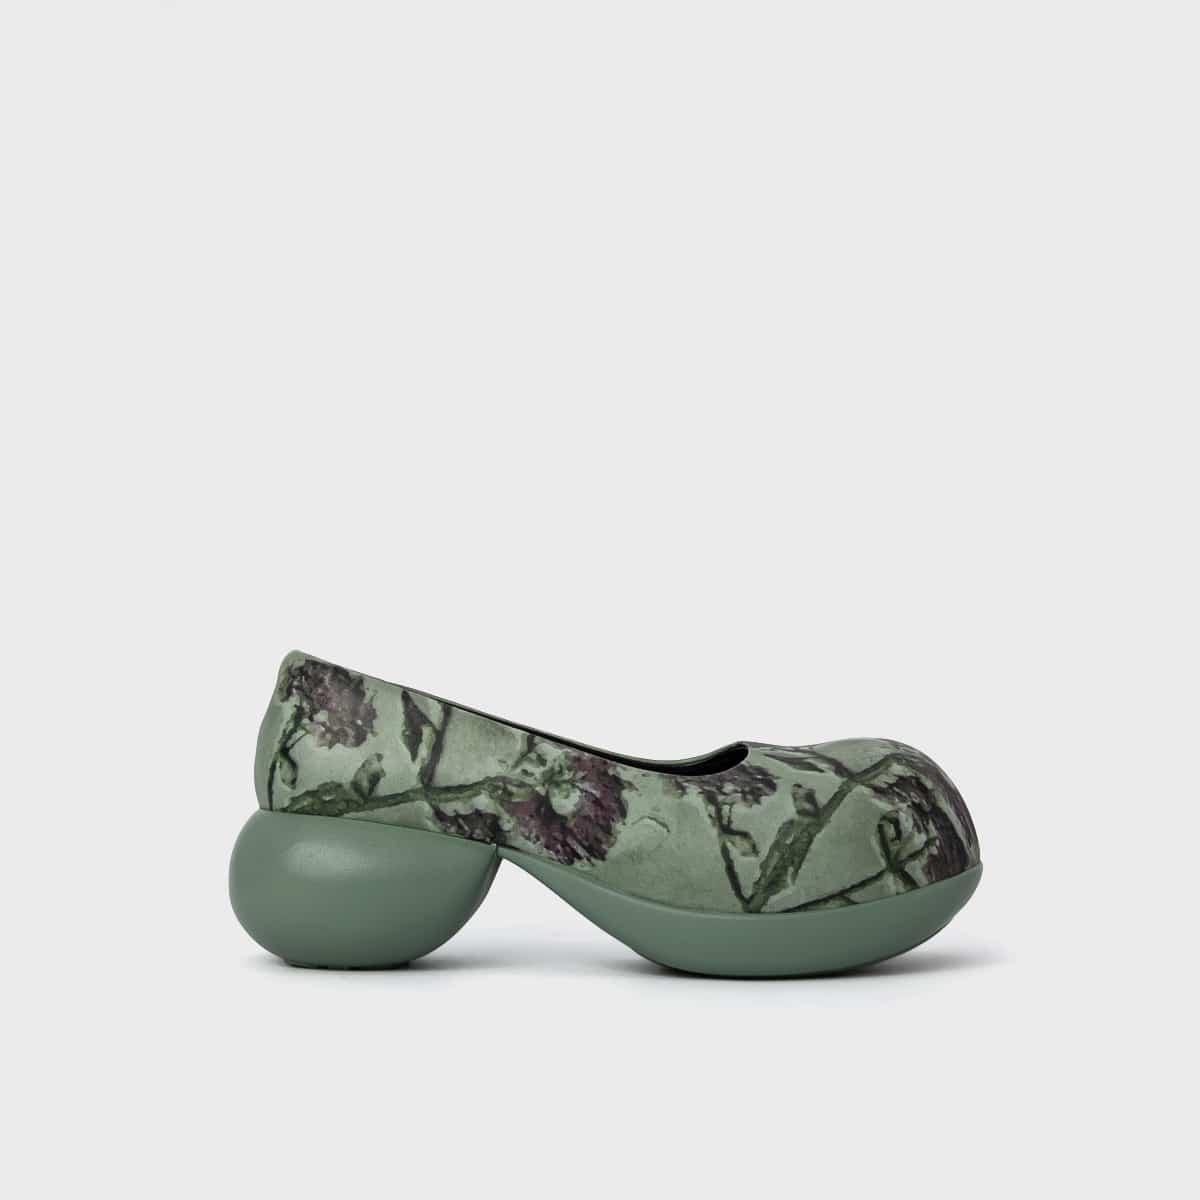 VeniceW Bobtail Shoes